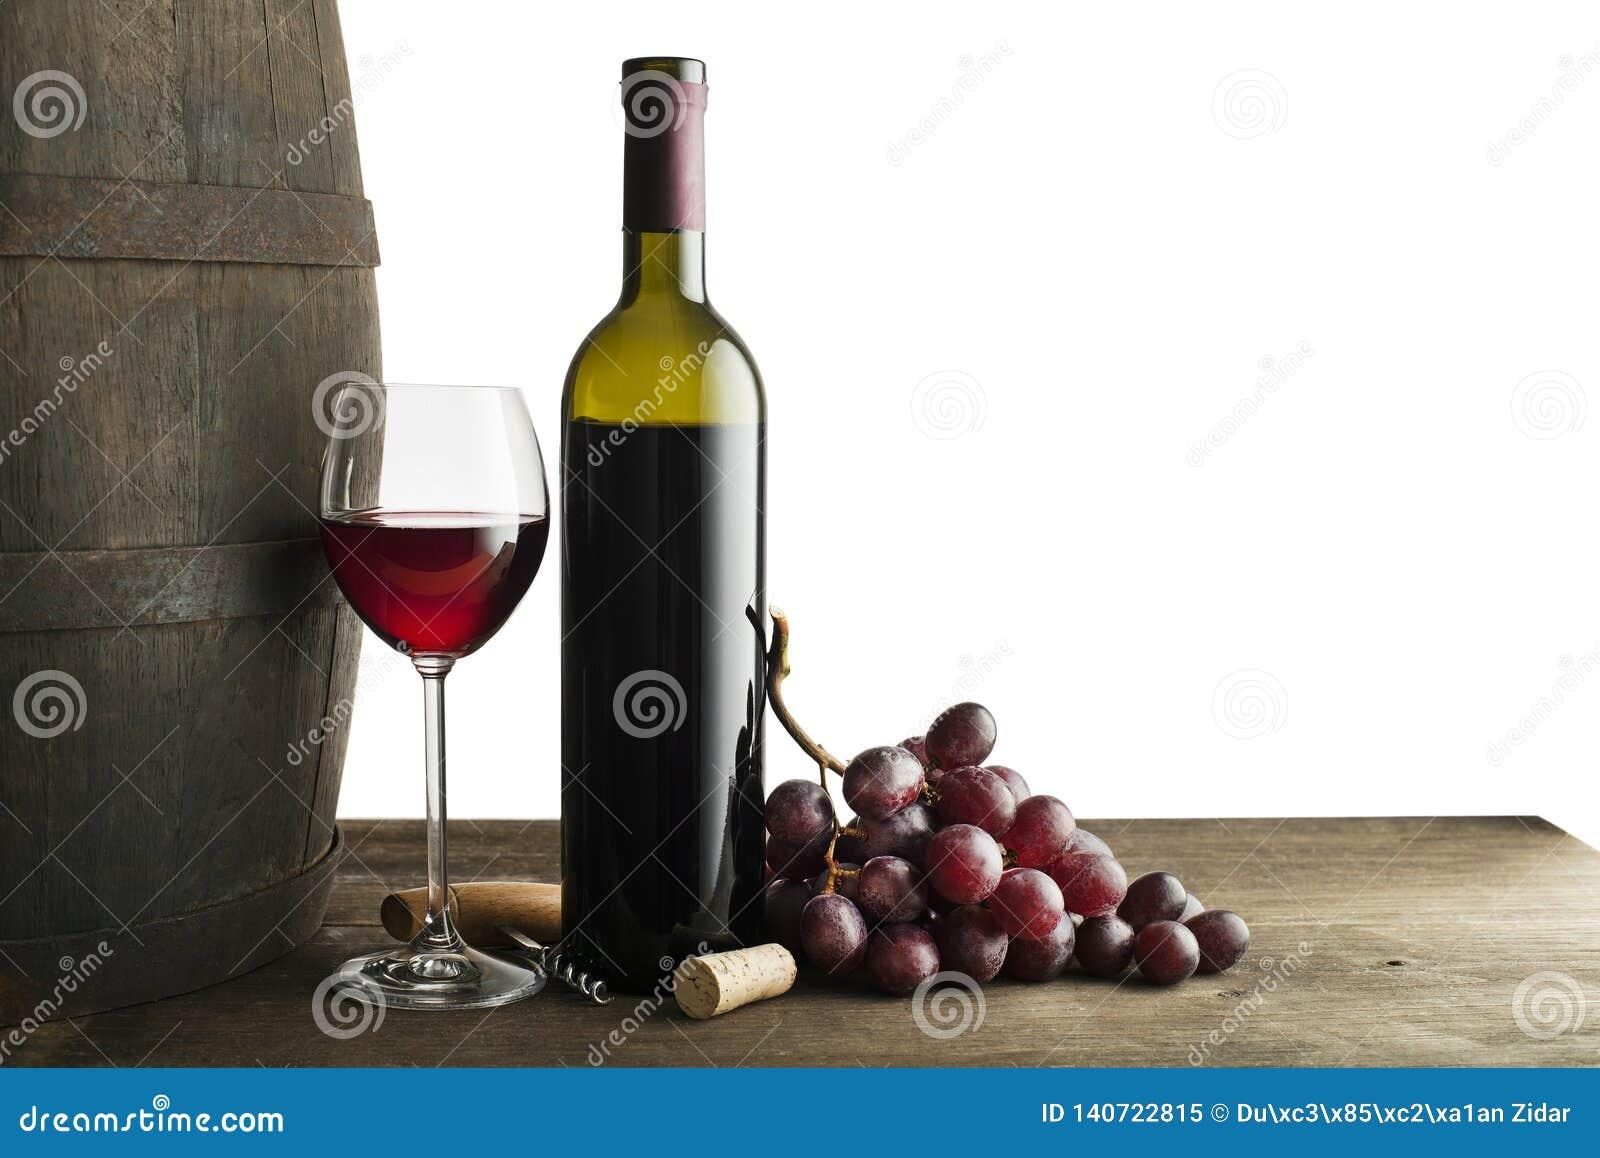 Garrafa e vidro de vinho tinto isolados no branco